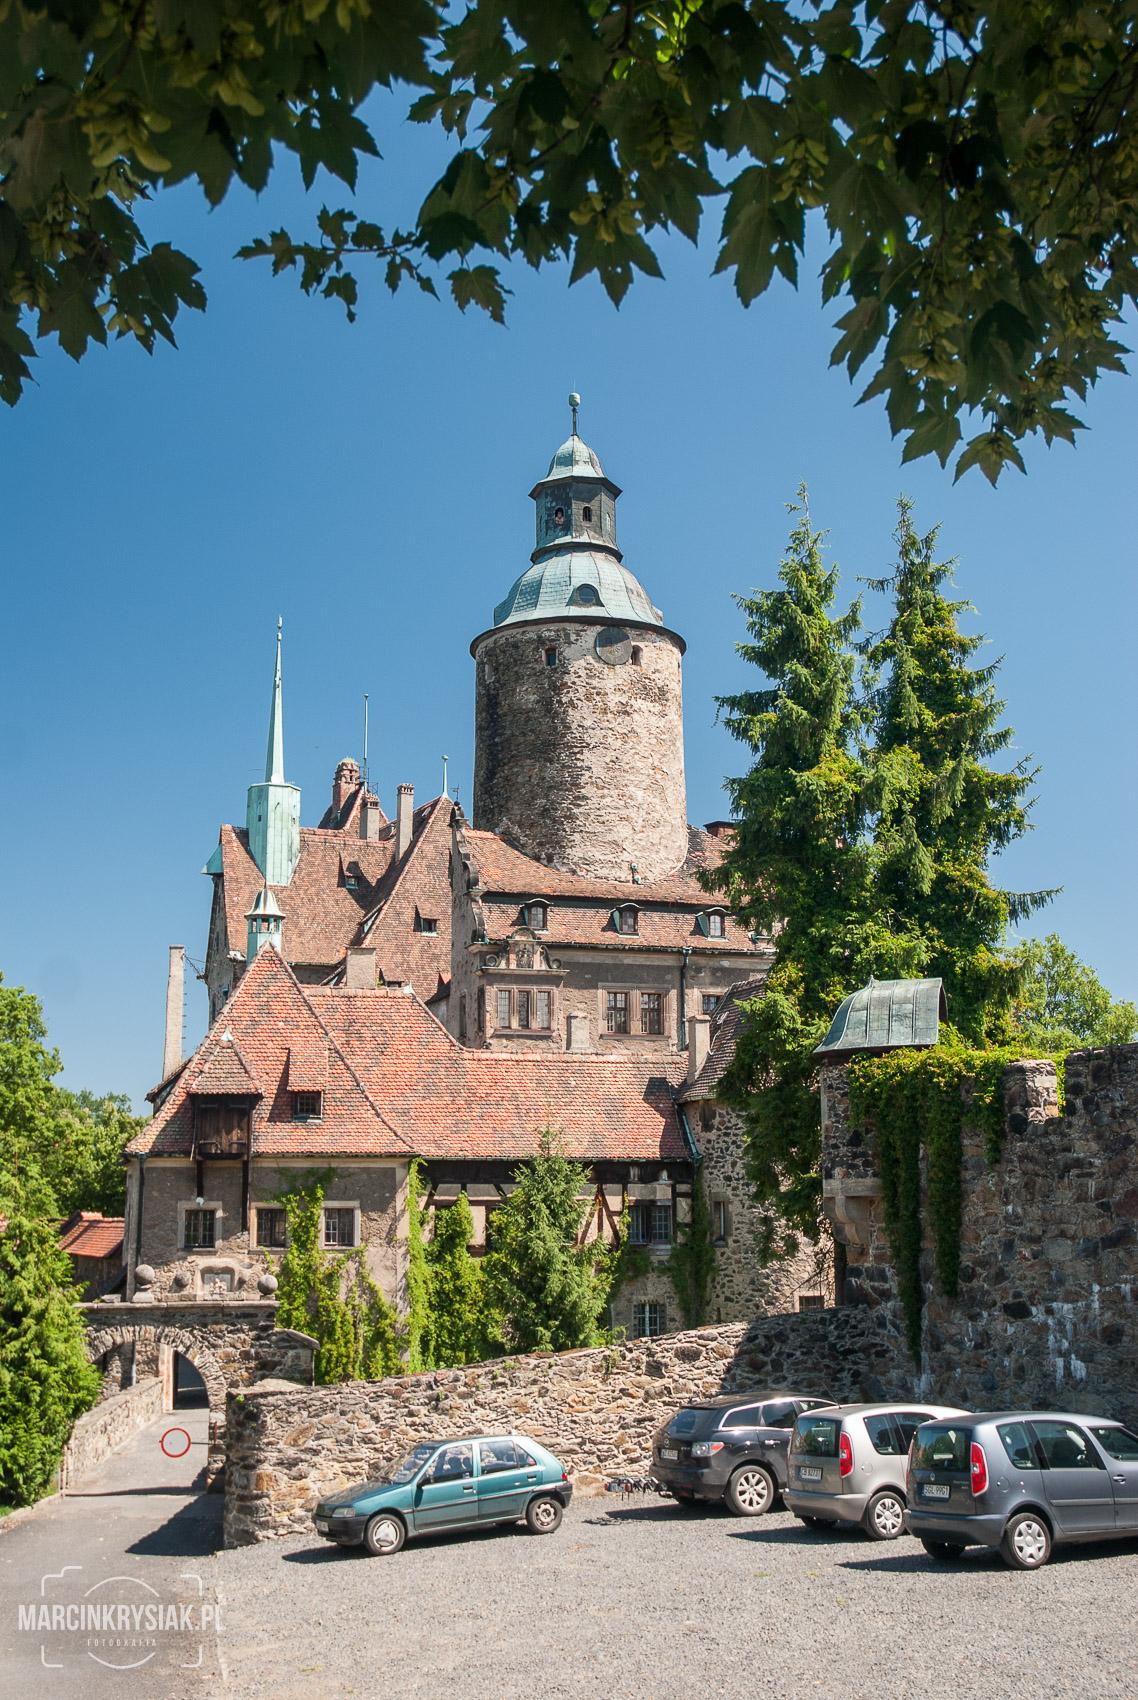 Zamek, Czocha, przód, pion, Le¶na, Polska